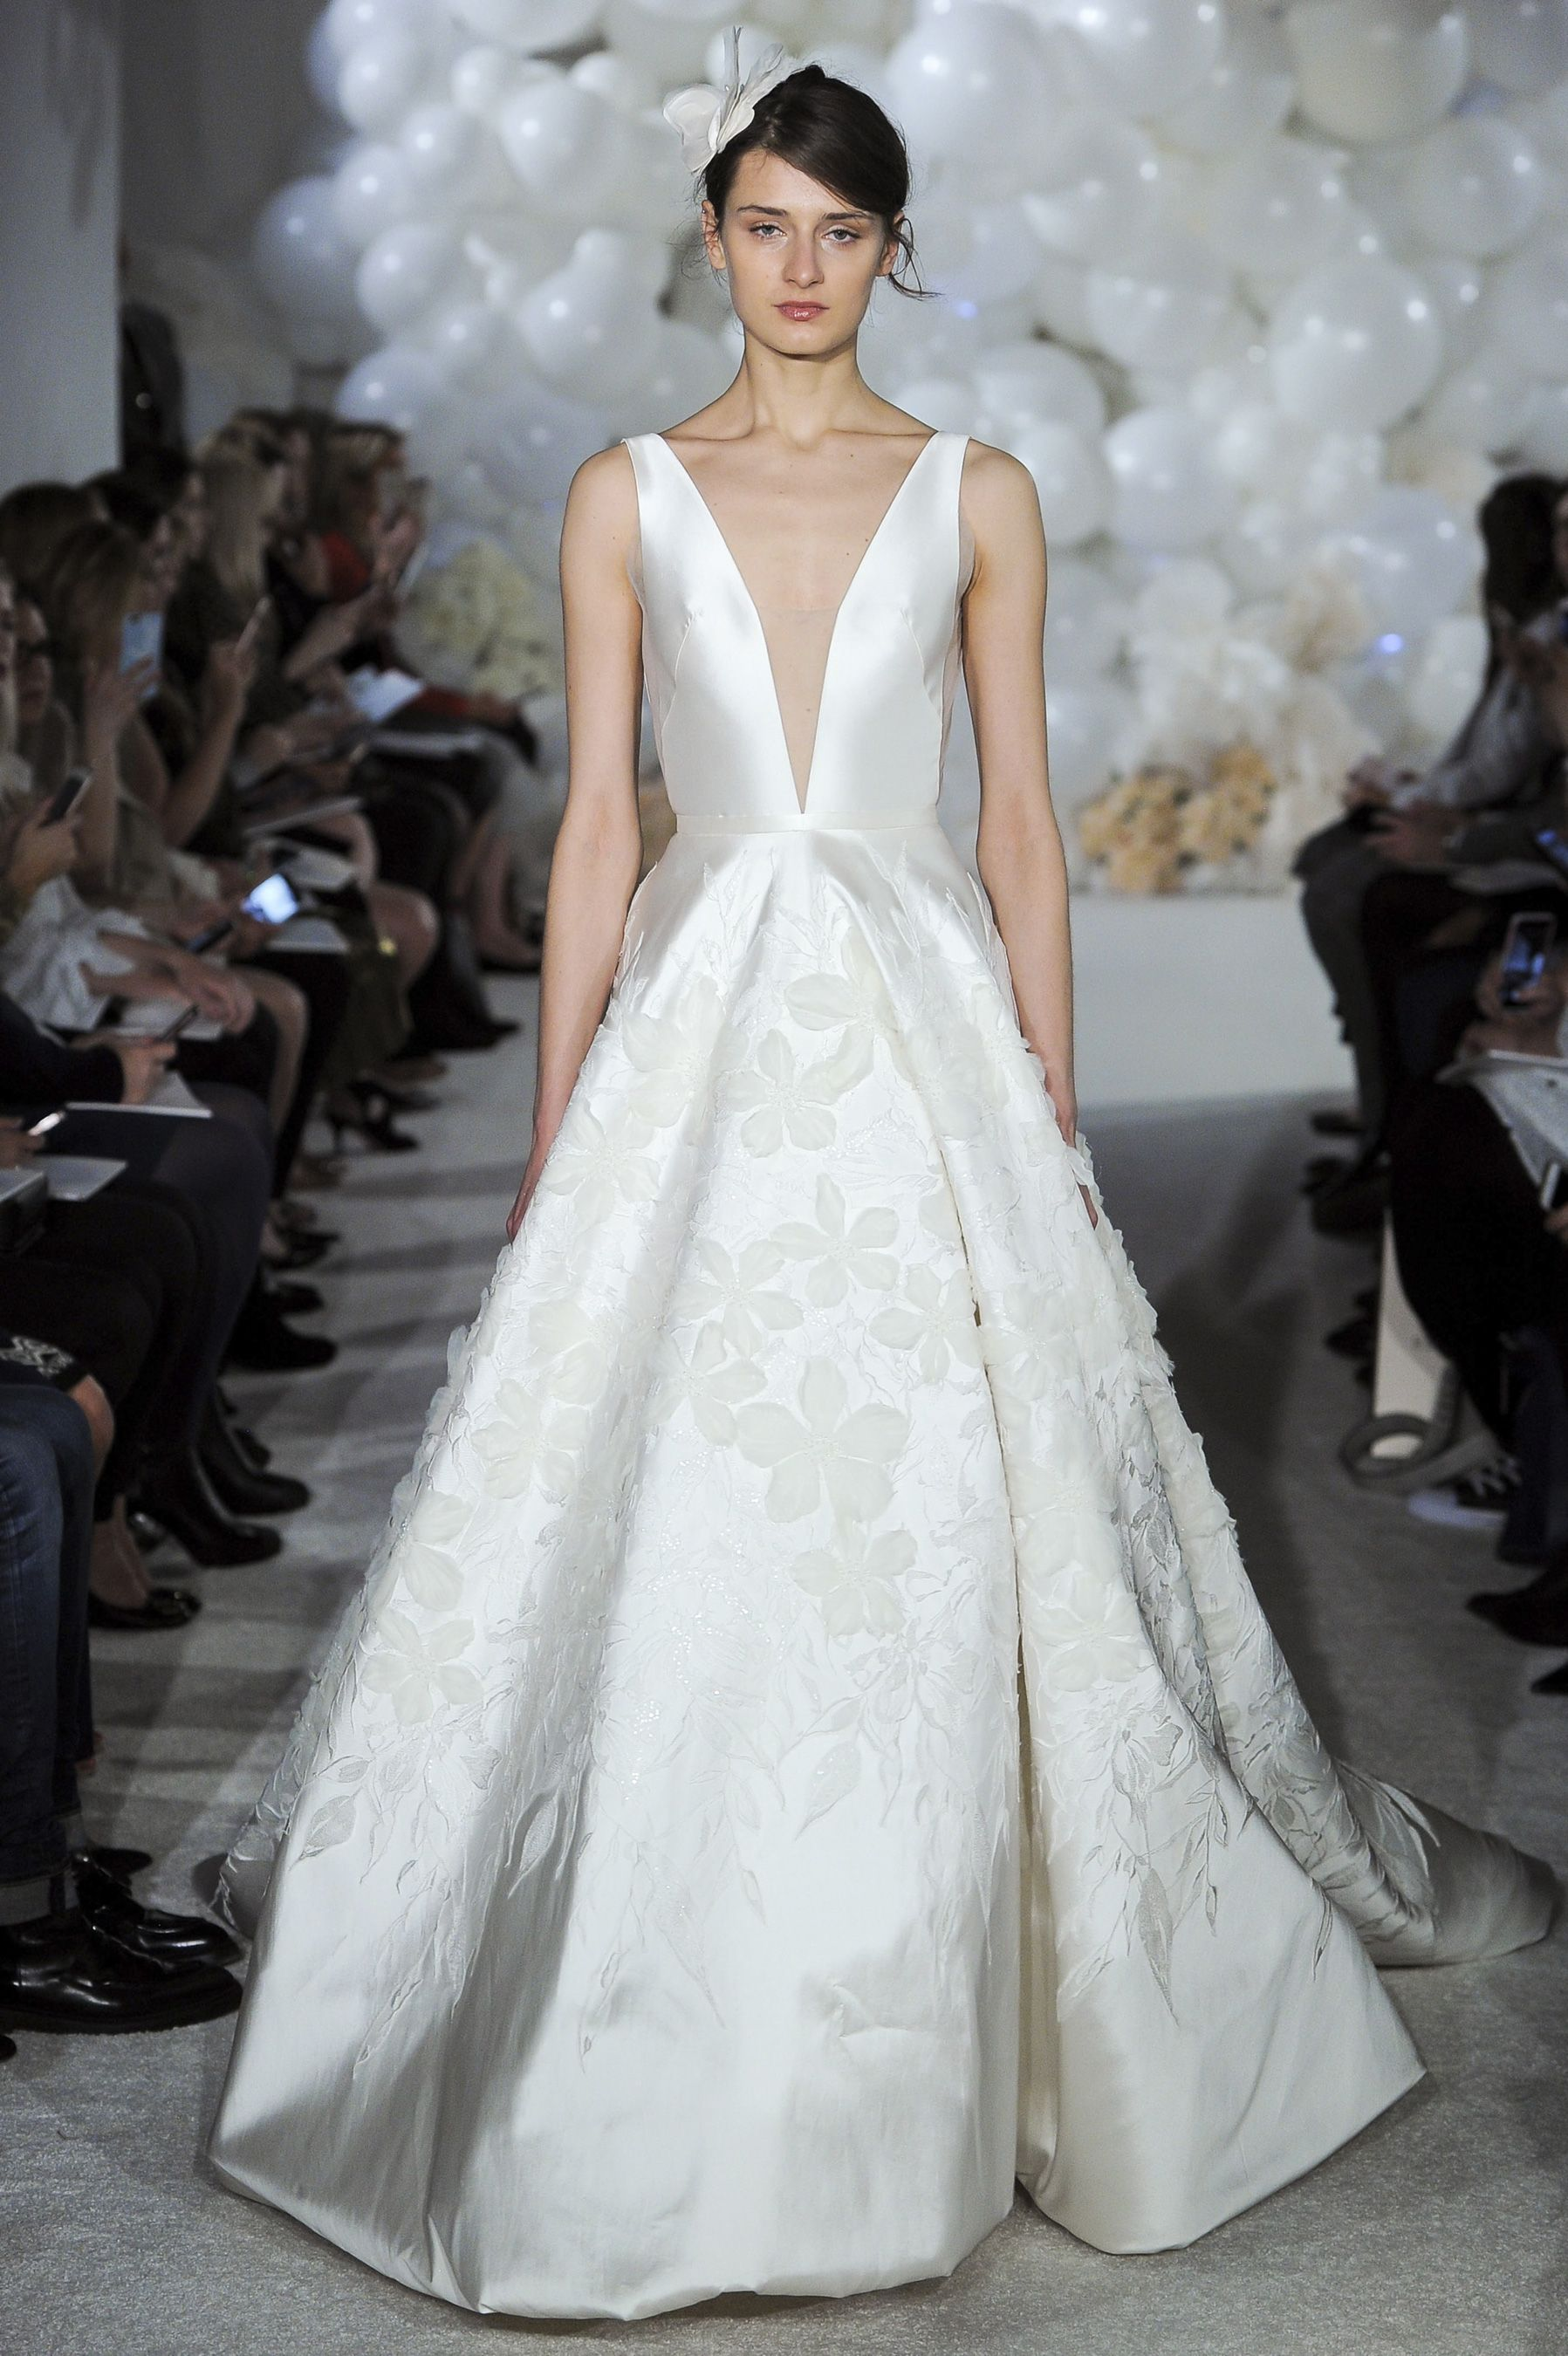 Mira zwillinger spring bridal fashion show nyfw new york